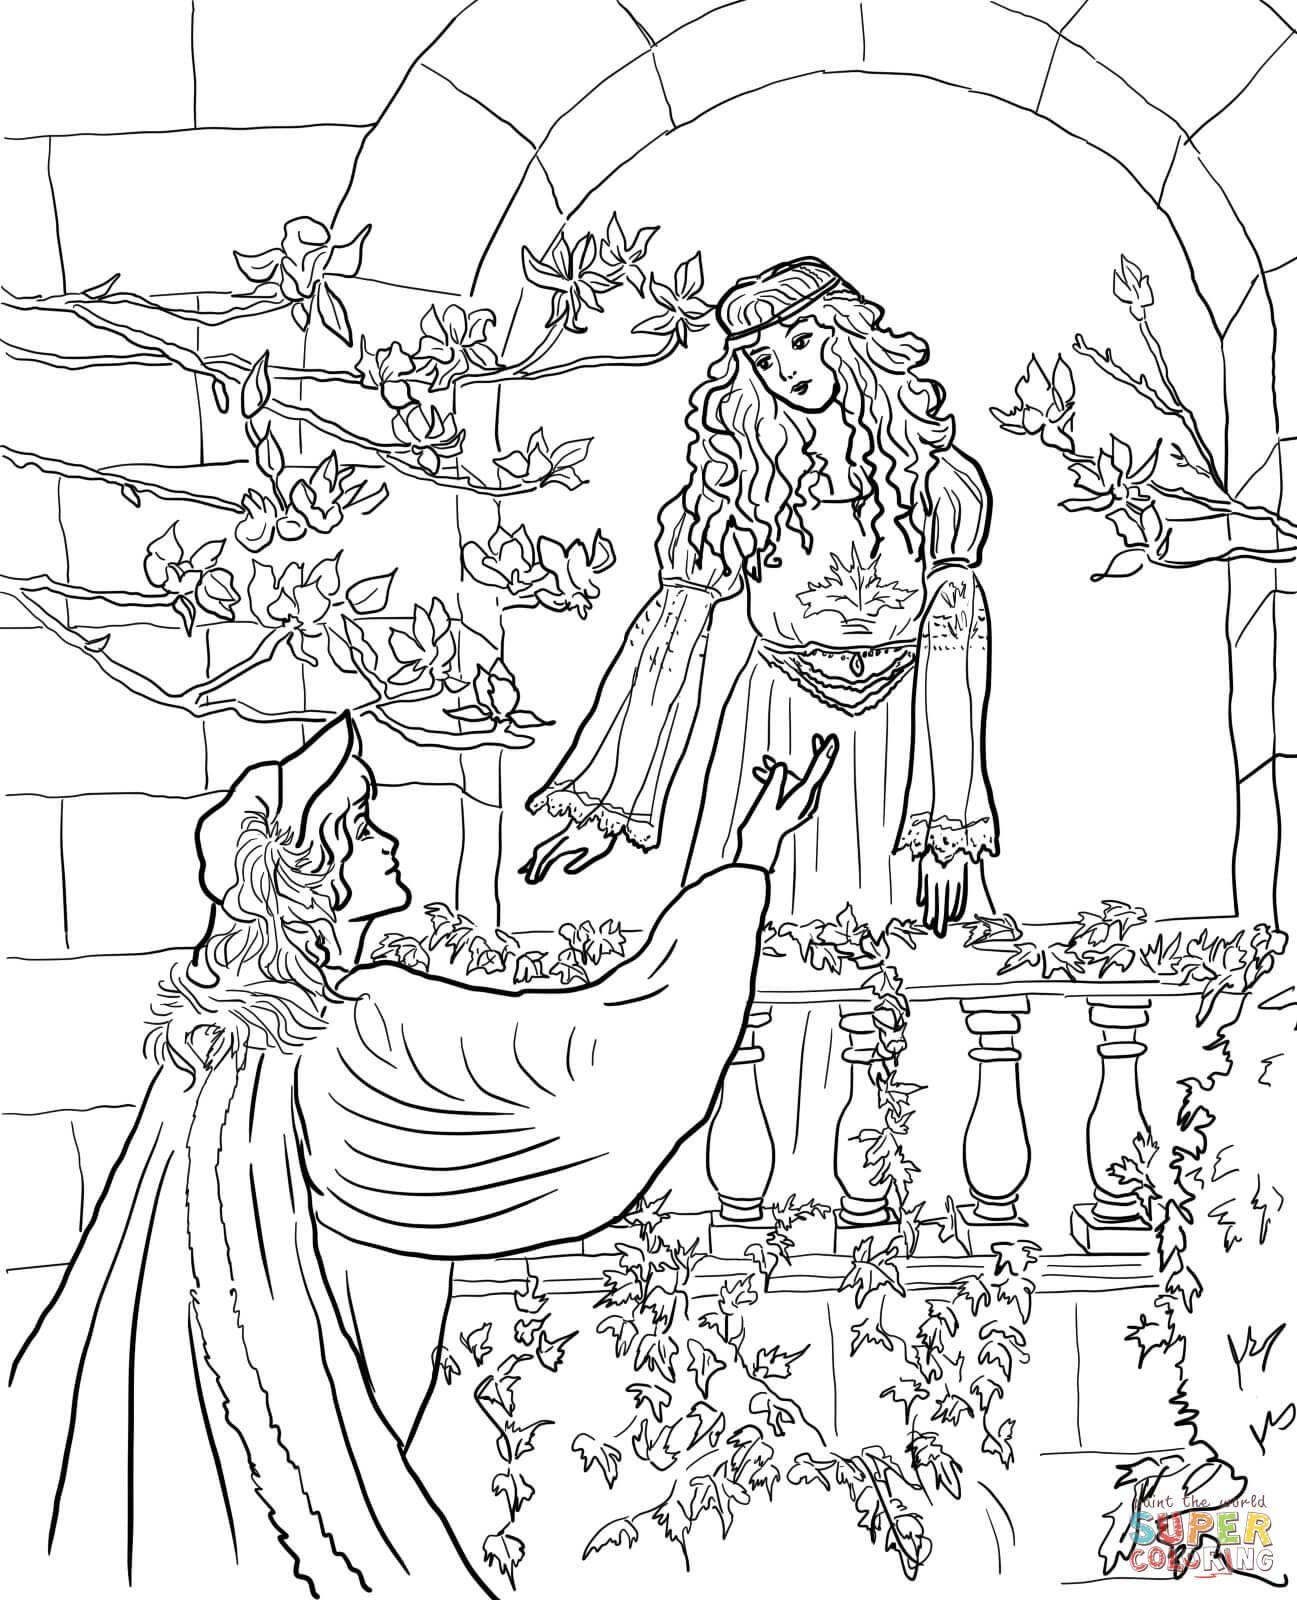 Romeo Say To Juliet On The Balcony